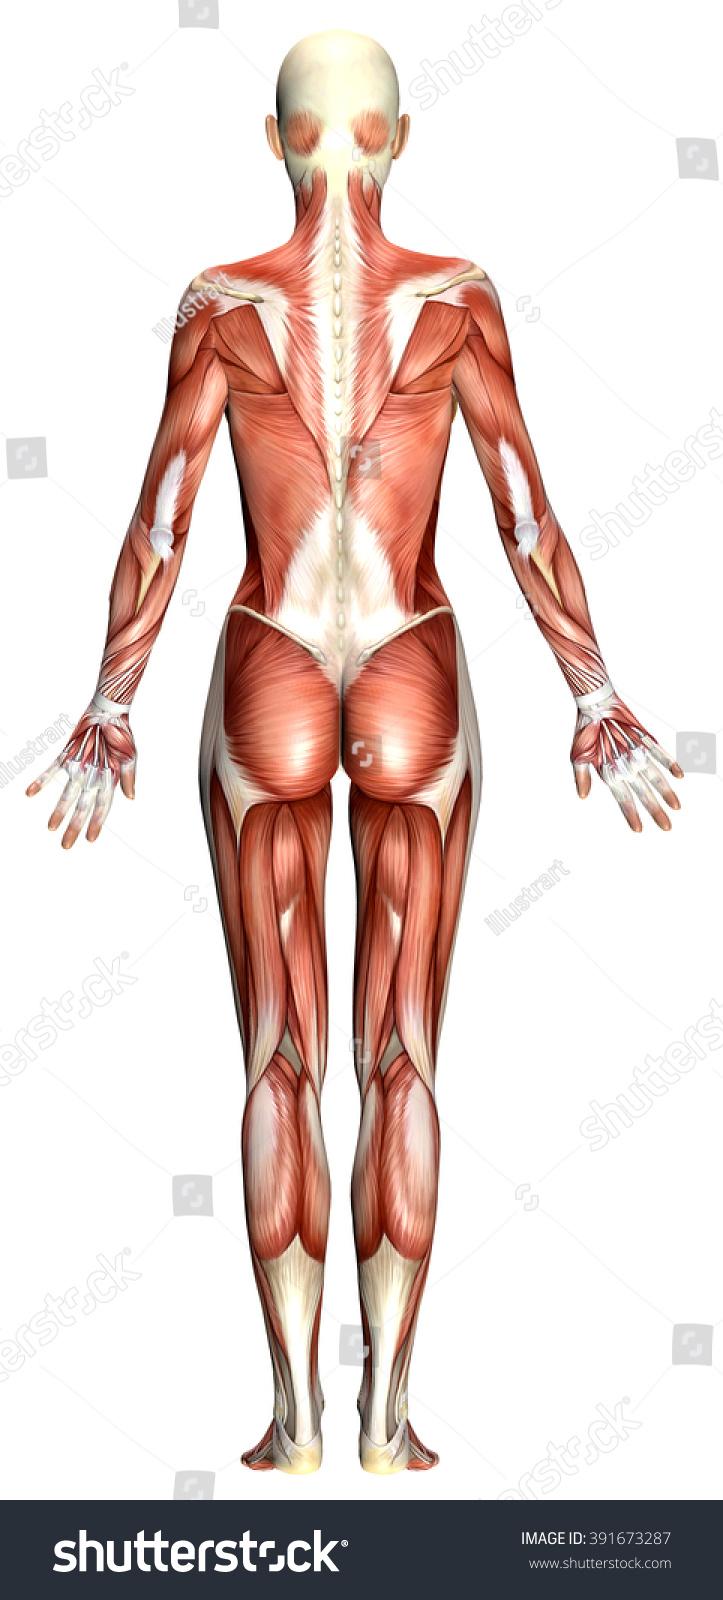 3d Female Body Anatomy Isolated On White Ez Canvas